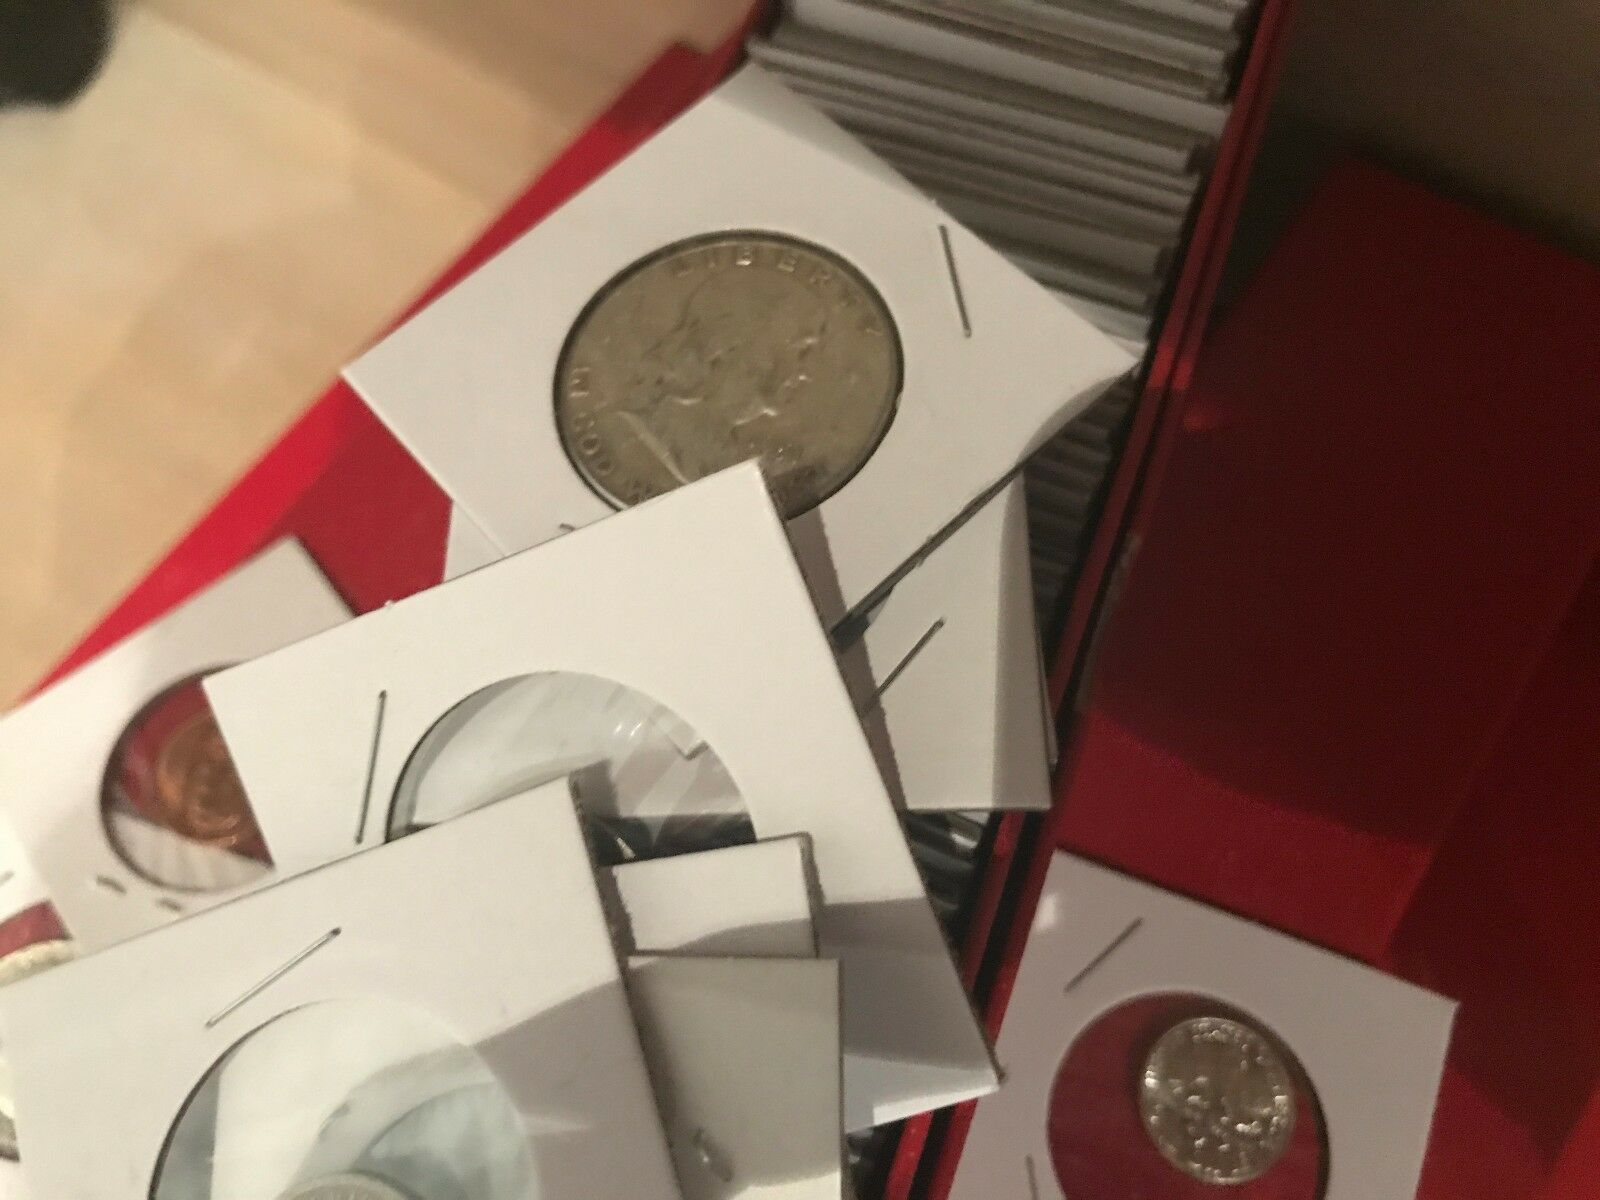 SILVER COINS ESTATE SALE GOLD BULLION US MONEY LIQUIDATION DOLLARS DIMES CENTS $